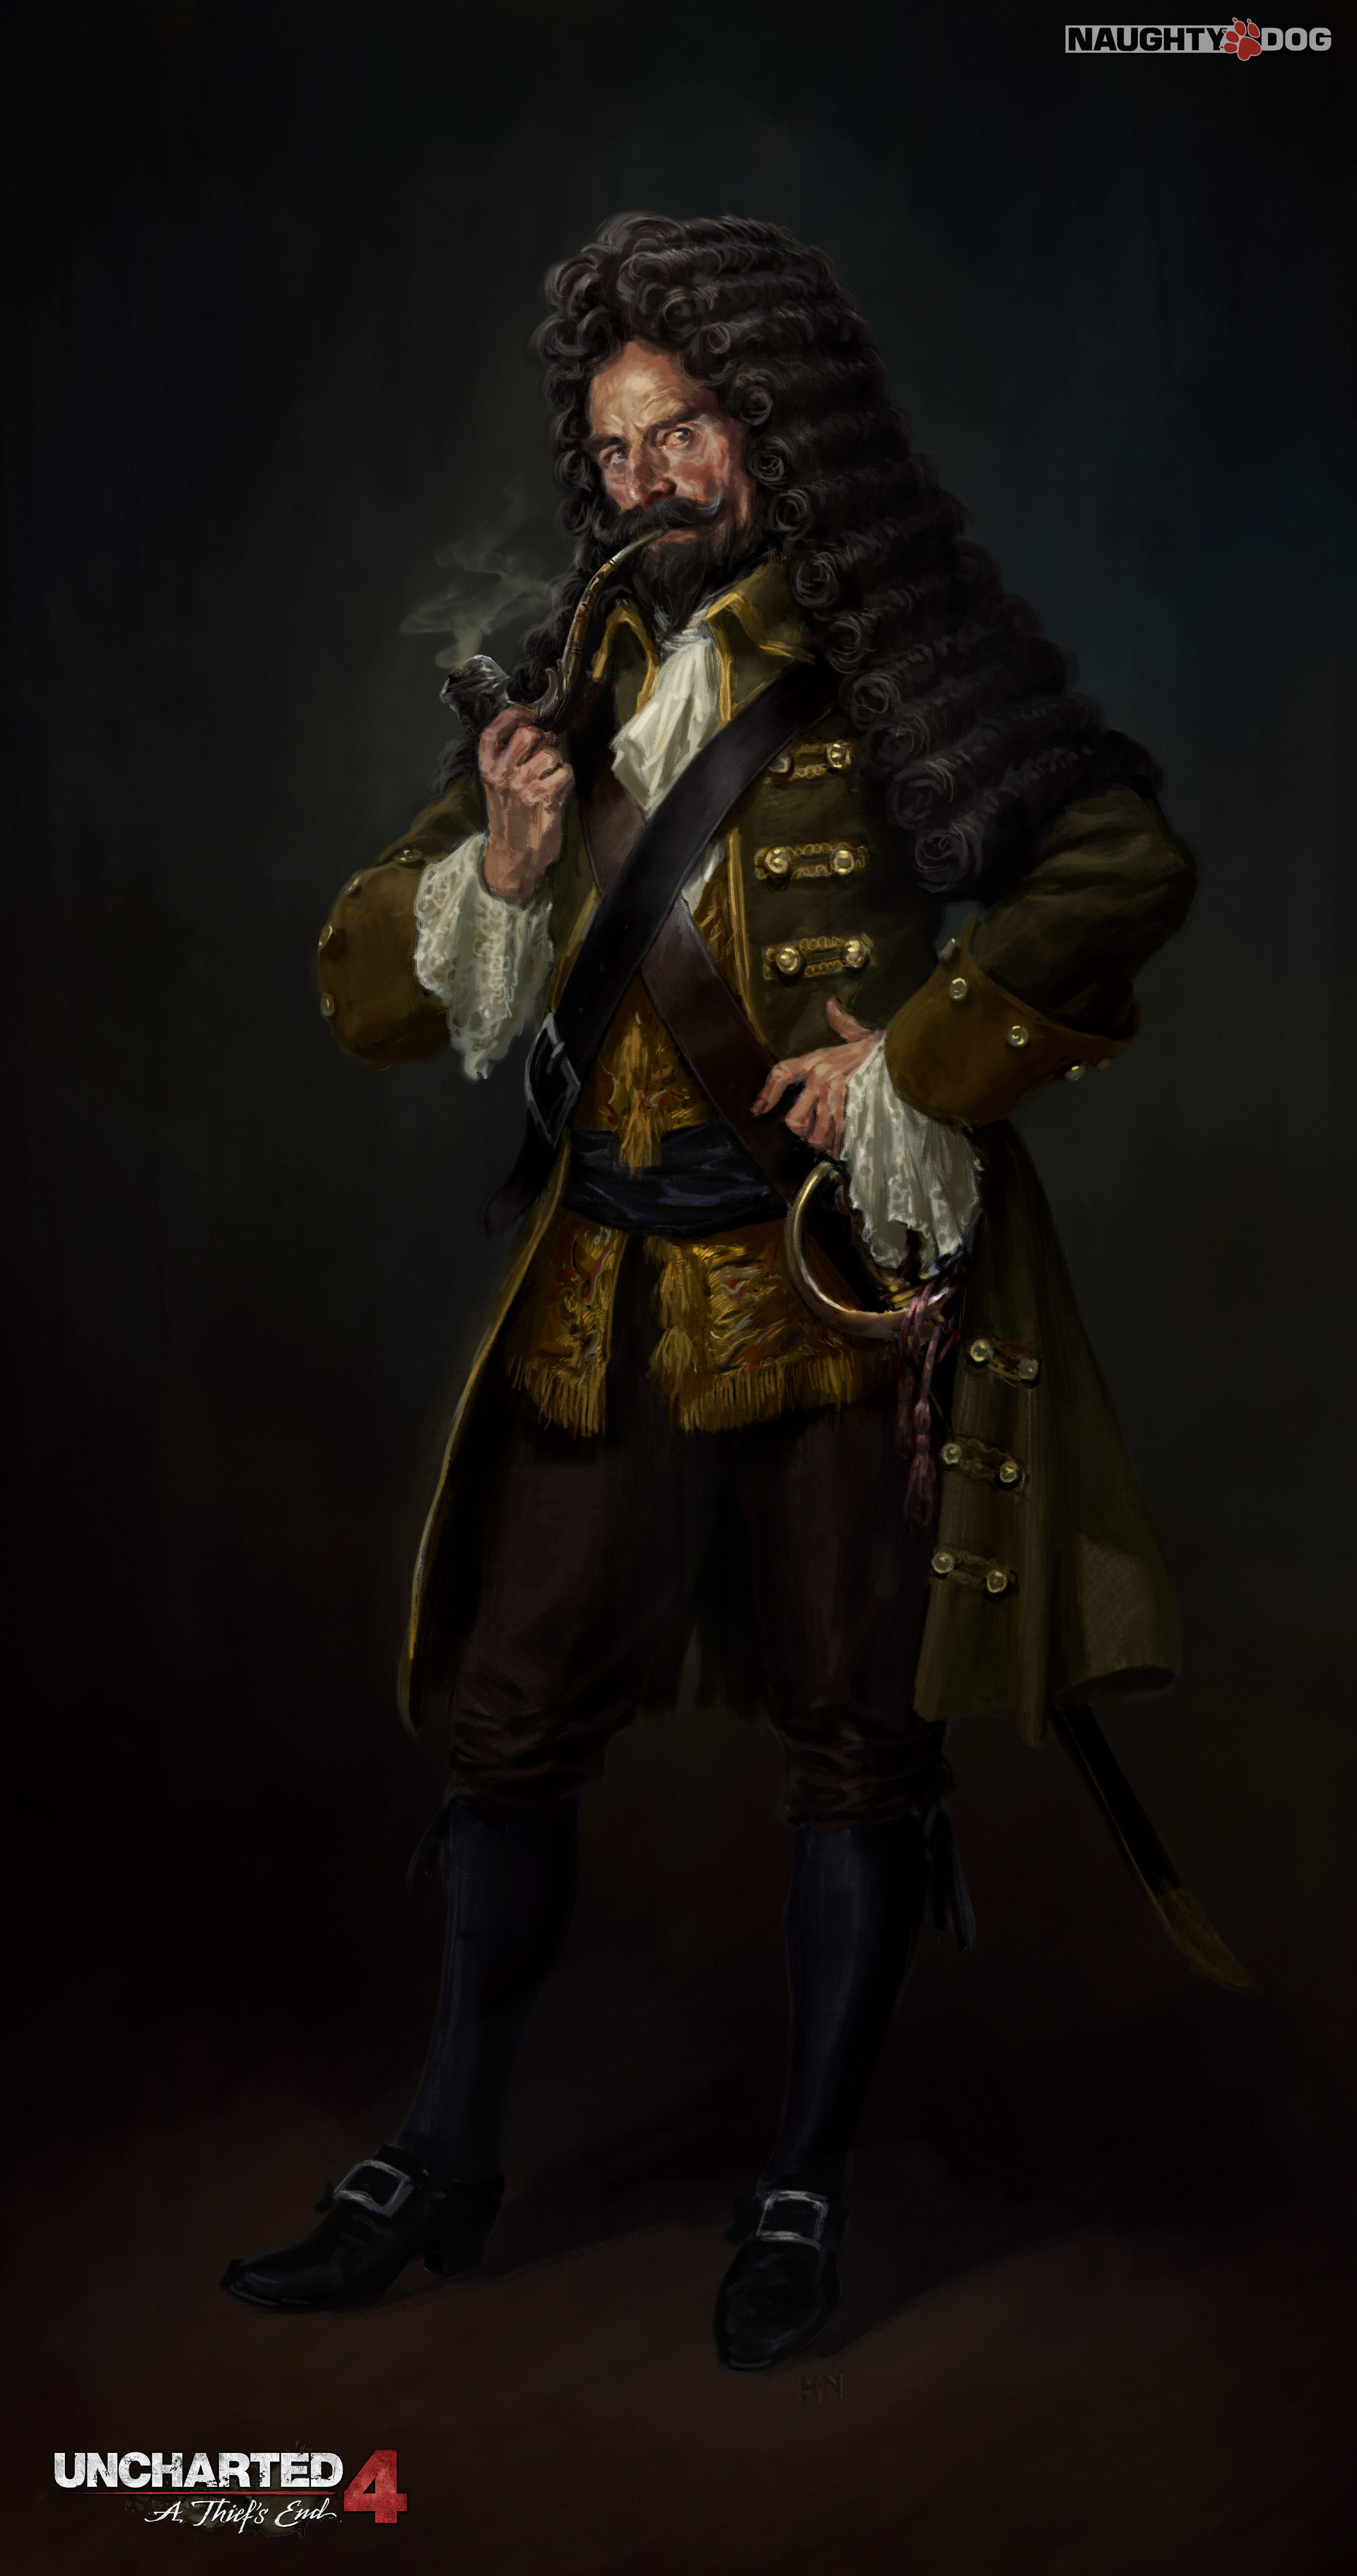 Hyoung nam pirate captain ill hn 06f